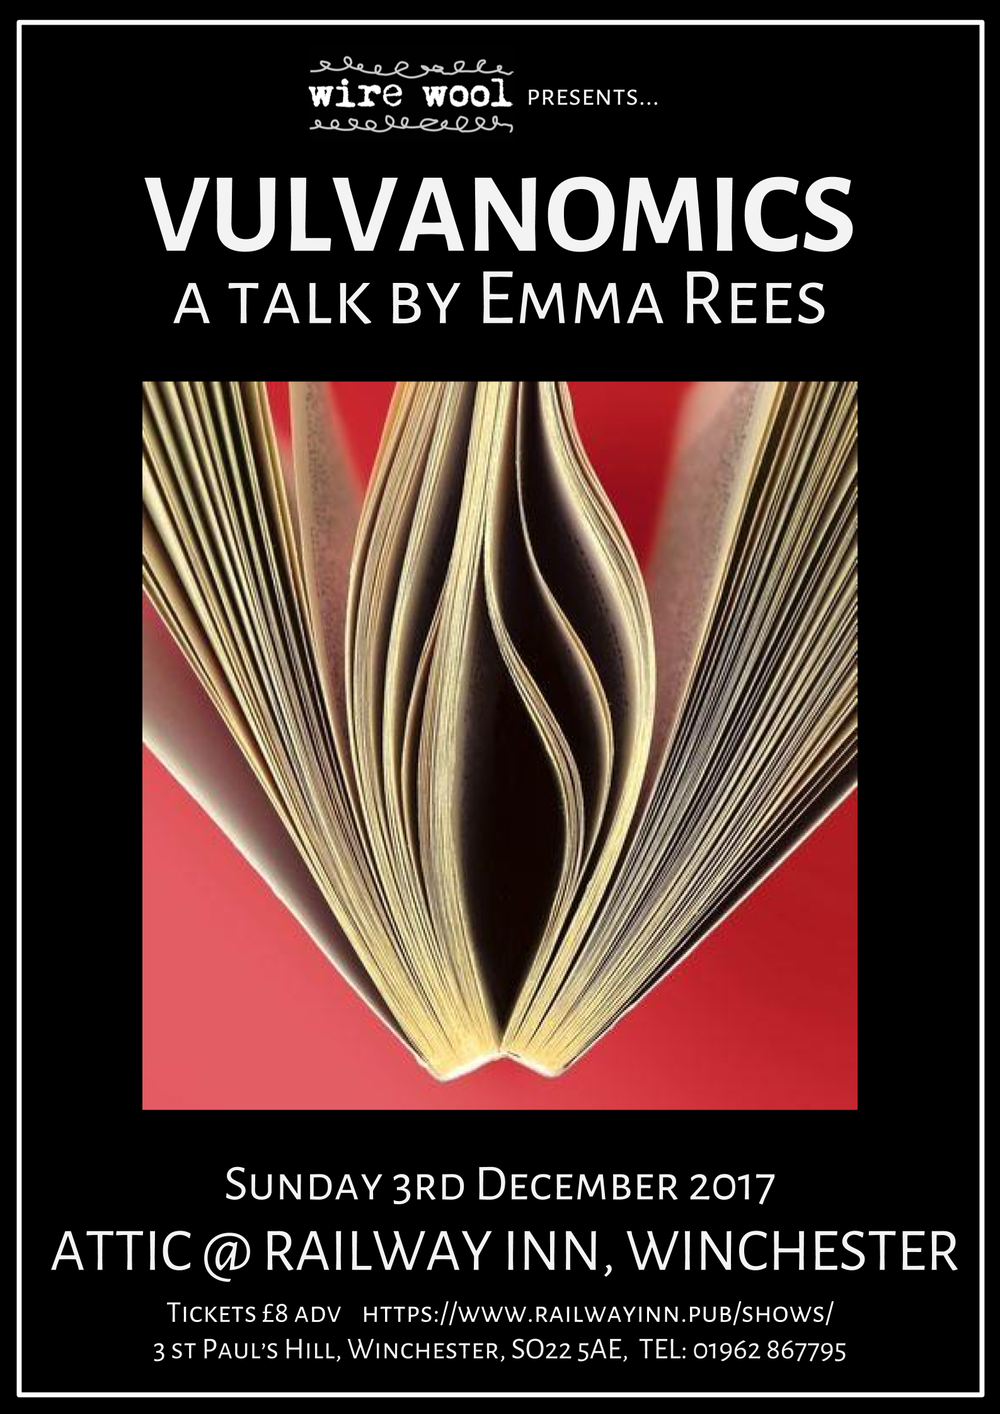 Vulvanomics